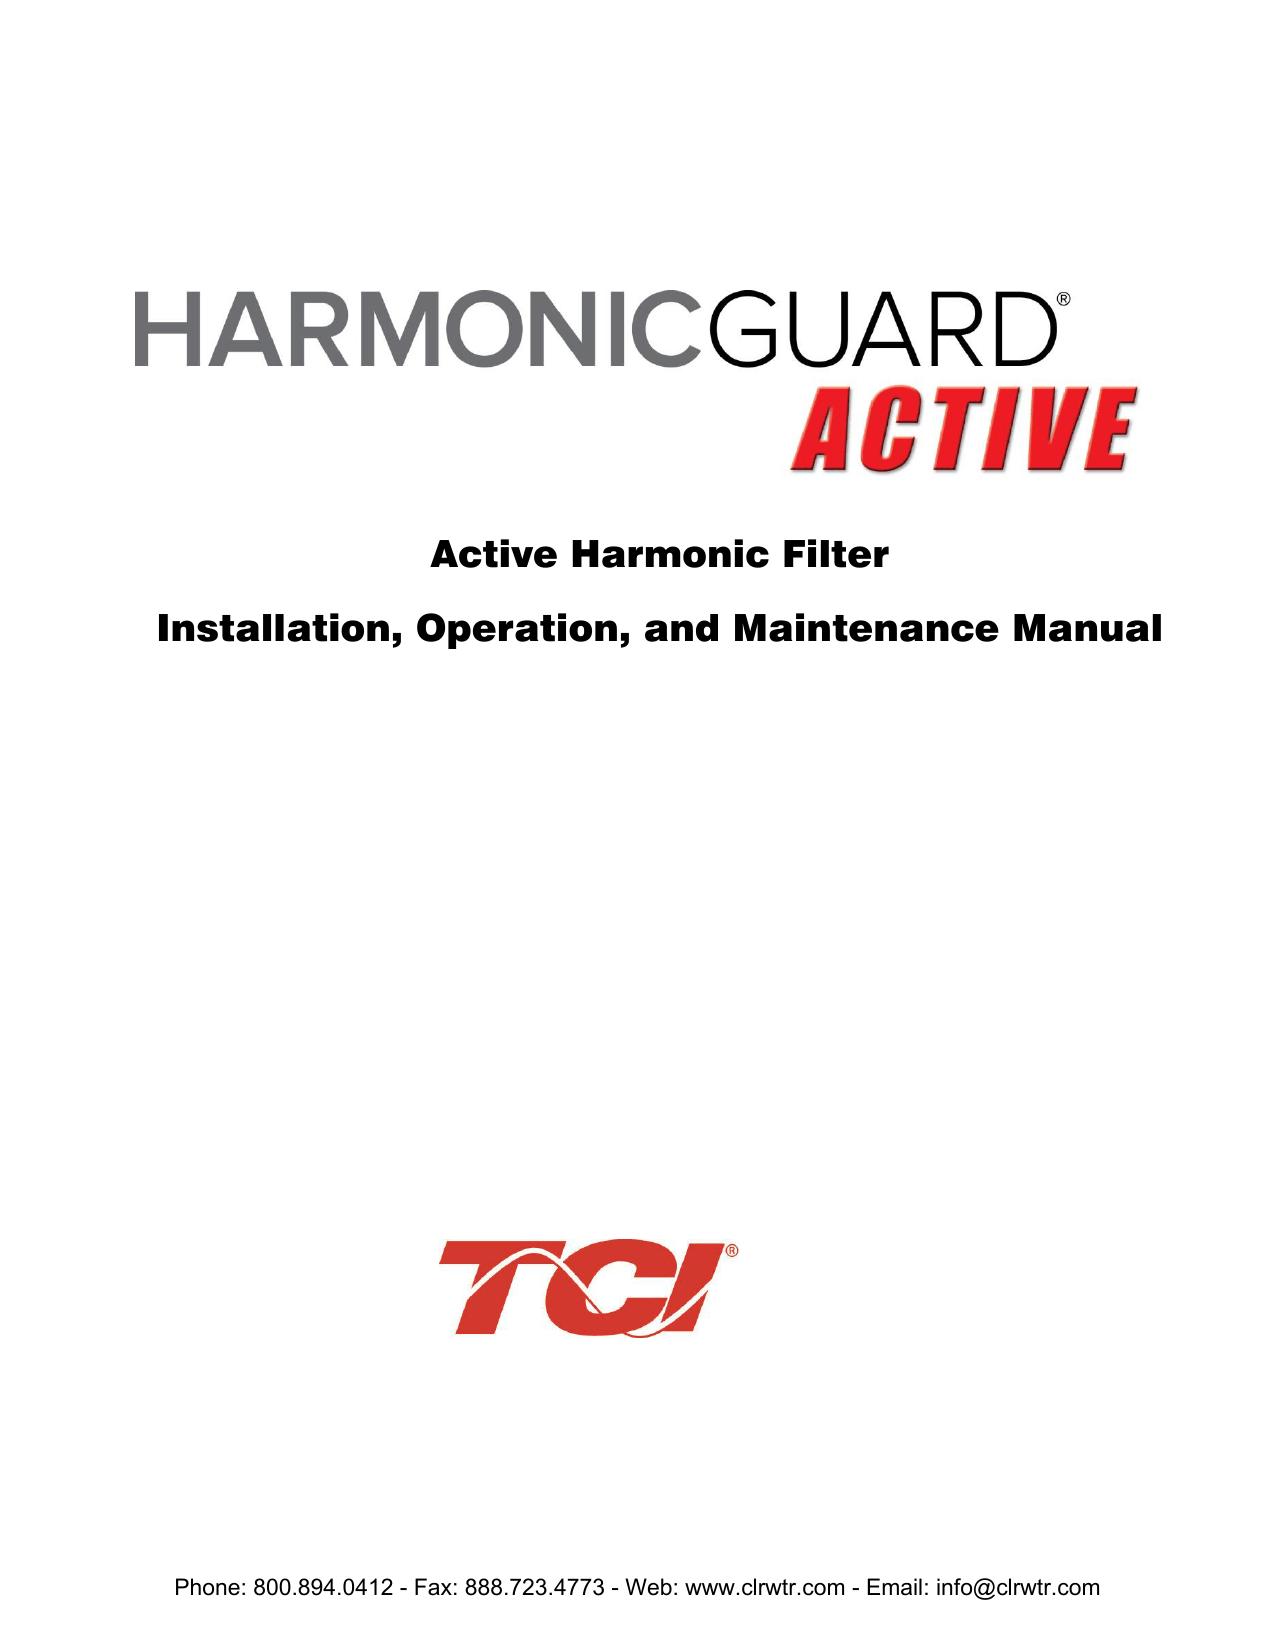 TCI HarmonicGuard Active Filter Installation, Operation